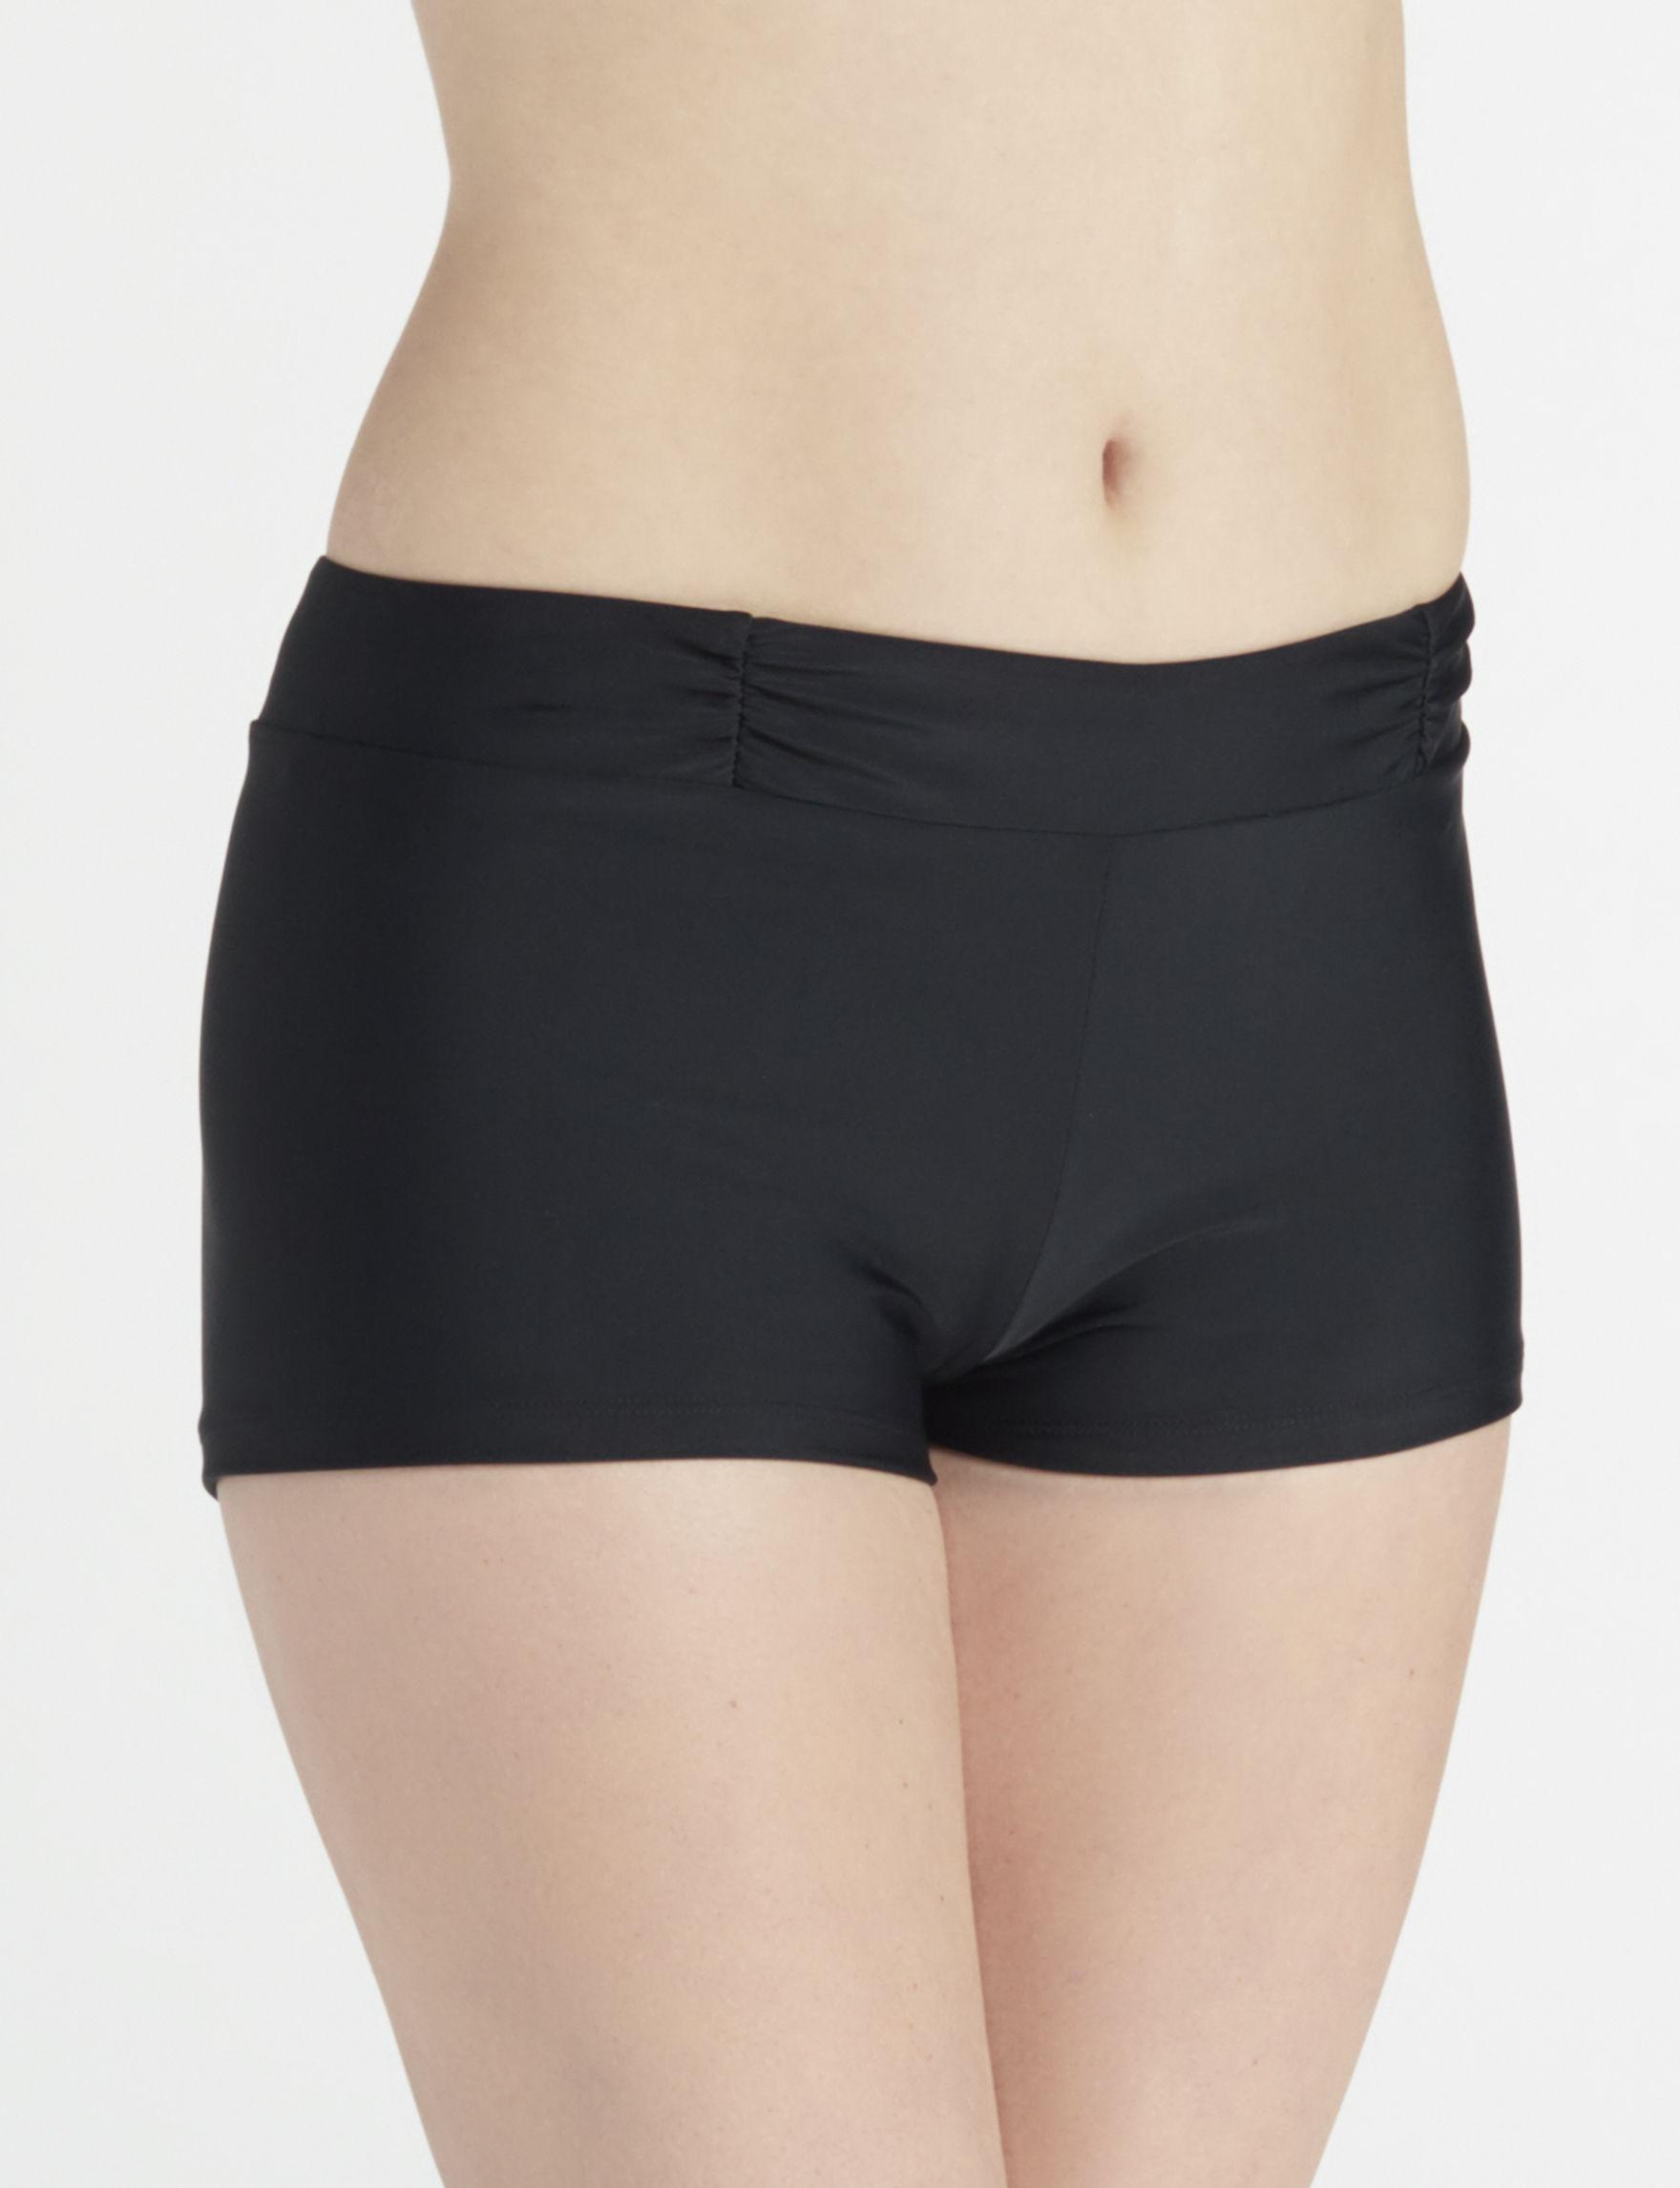 Aqua Couture Black Swimsuit Bottoms Boyshort